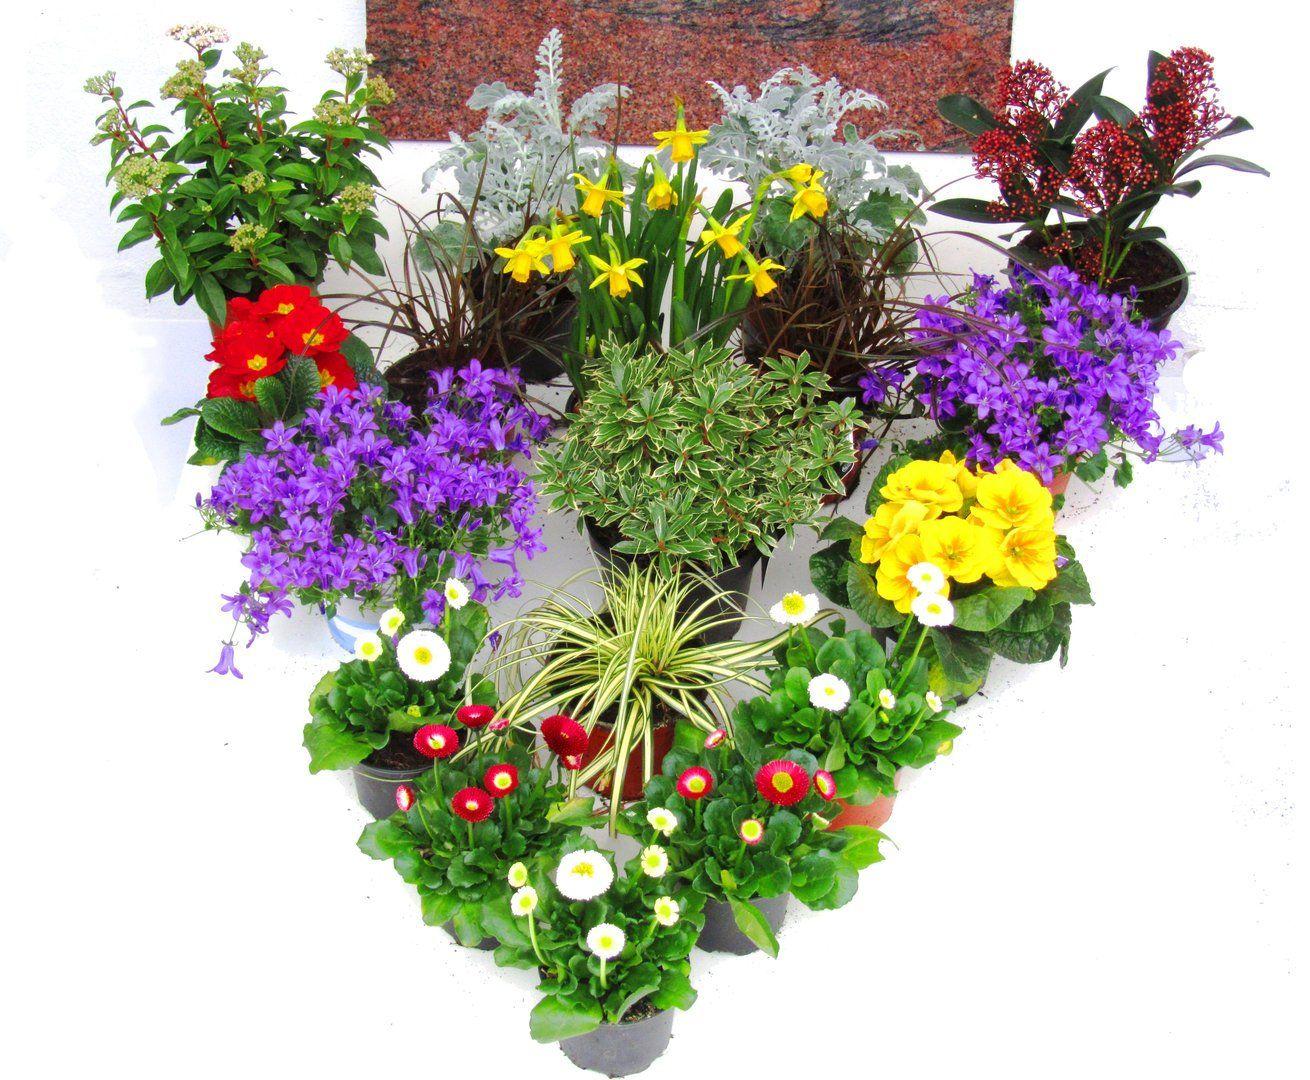 Balkonkasten Bepflanzen Ideen Plants Garden Garden Landscaping